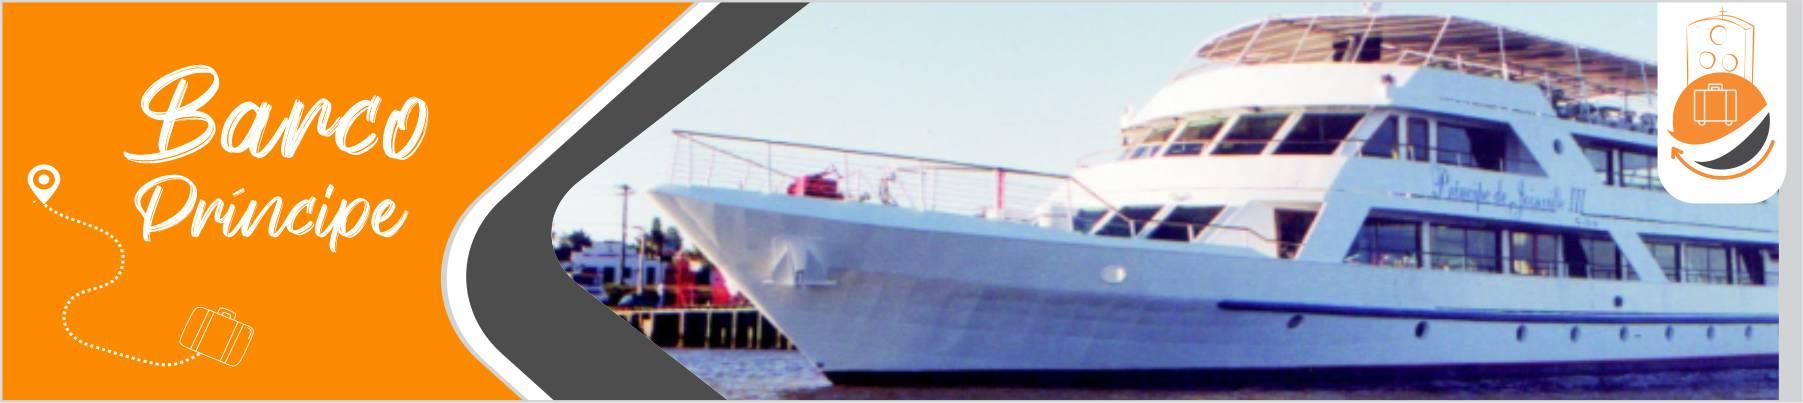 barco-principe